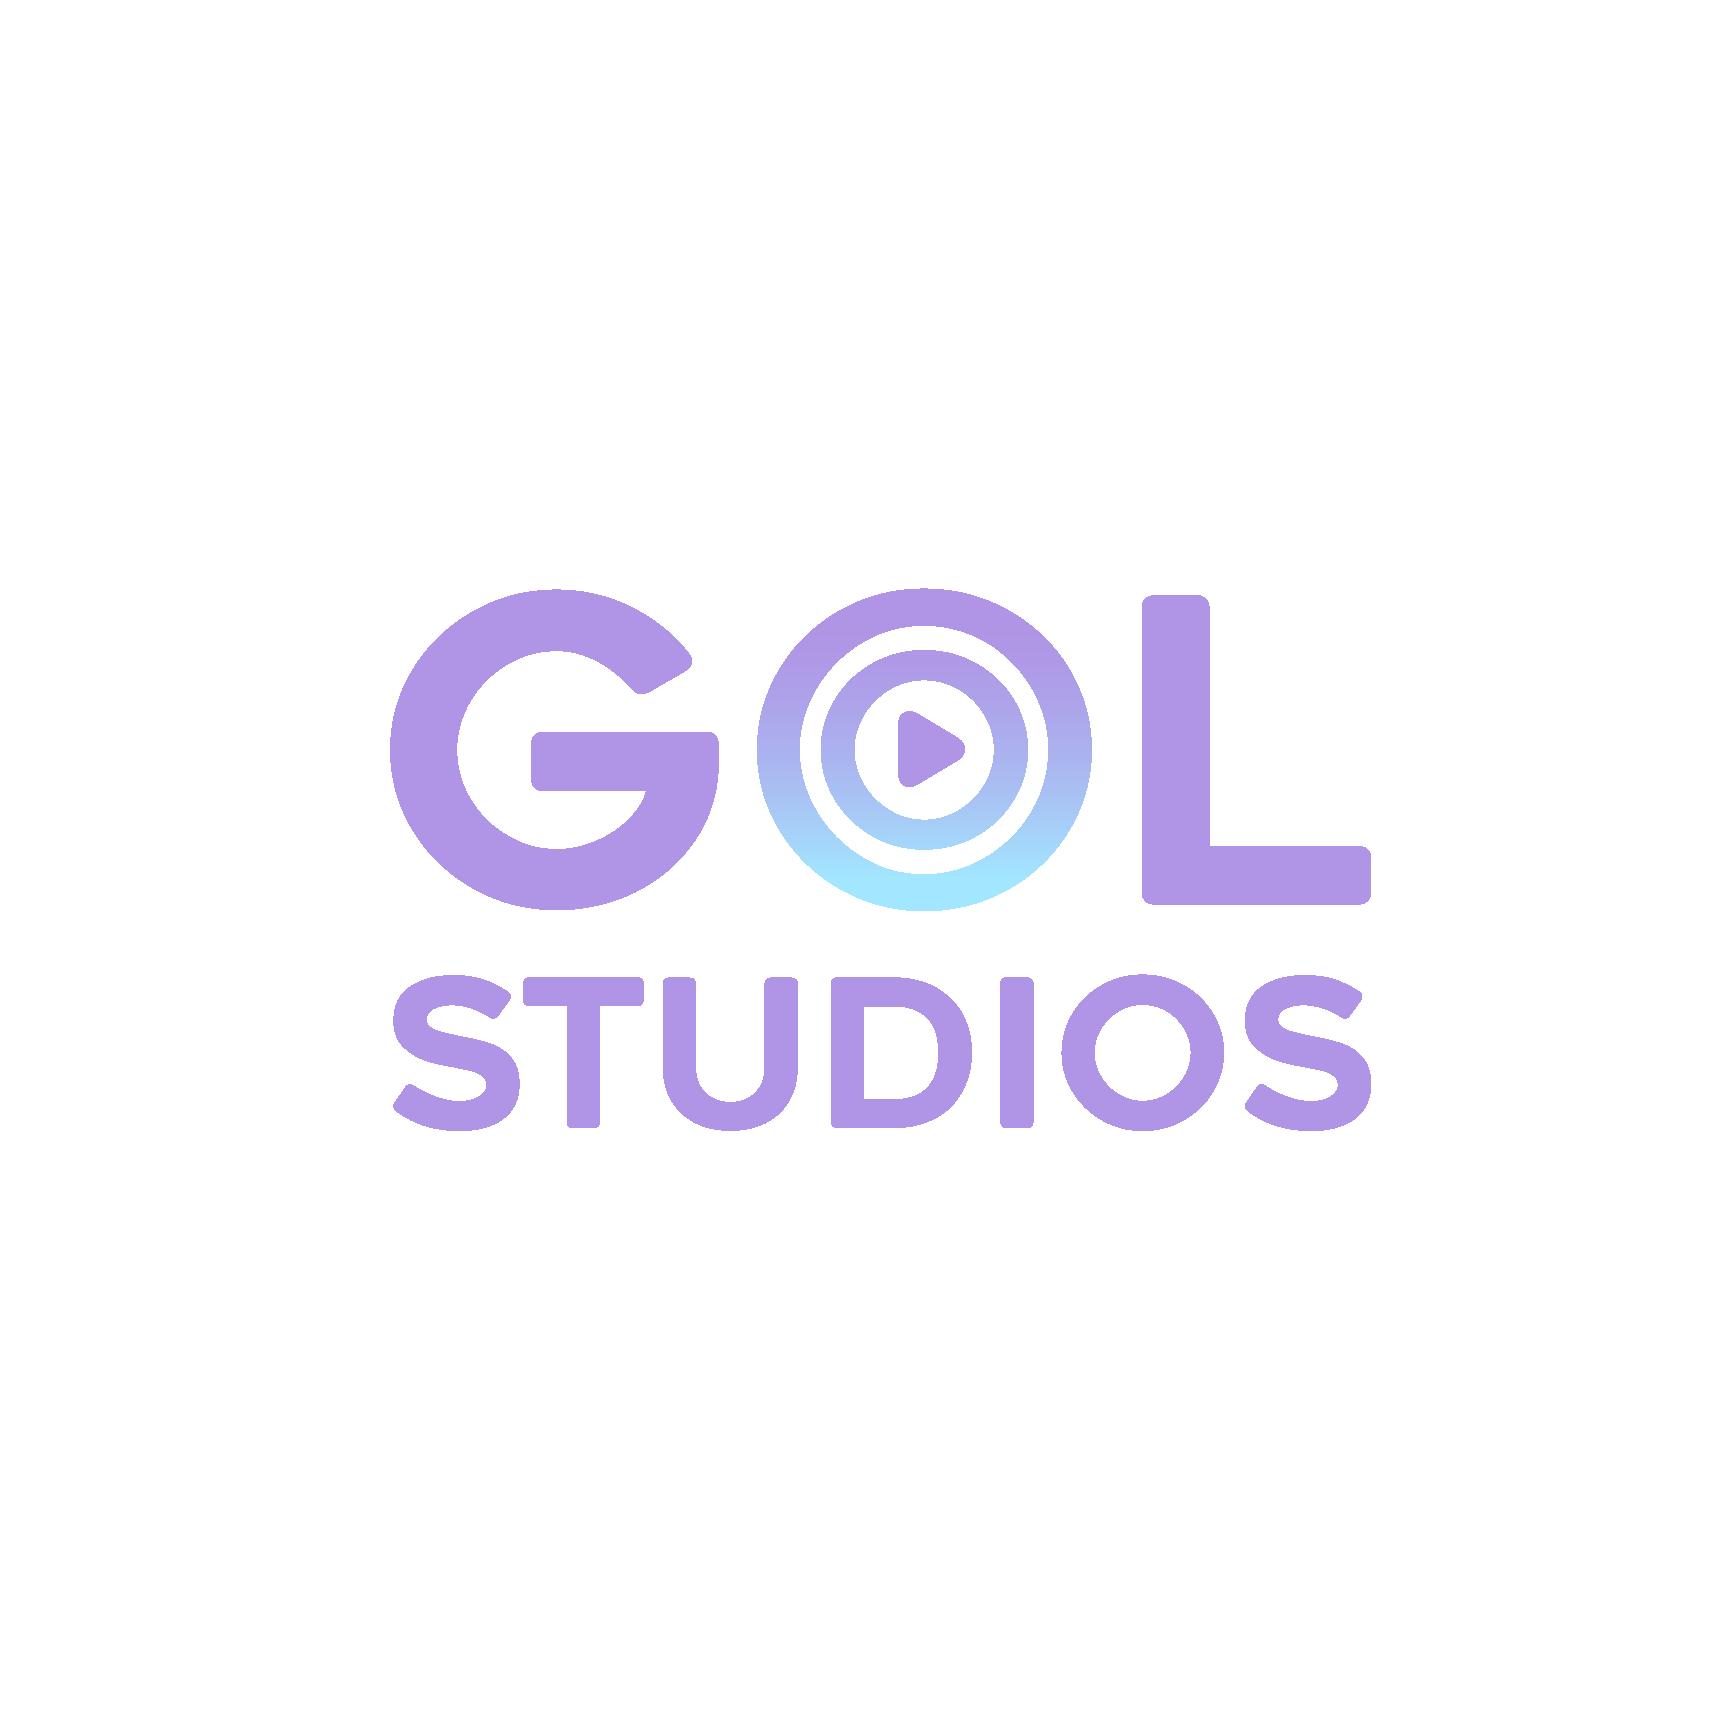 GOL Studios